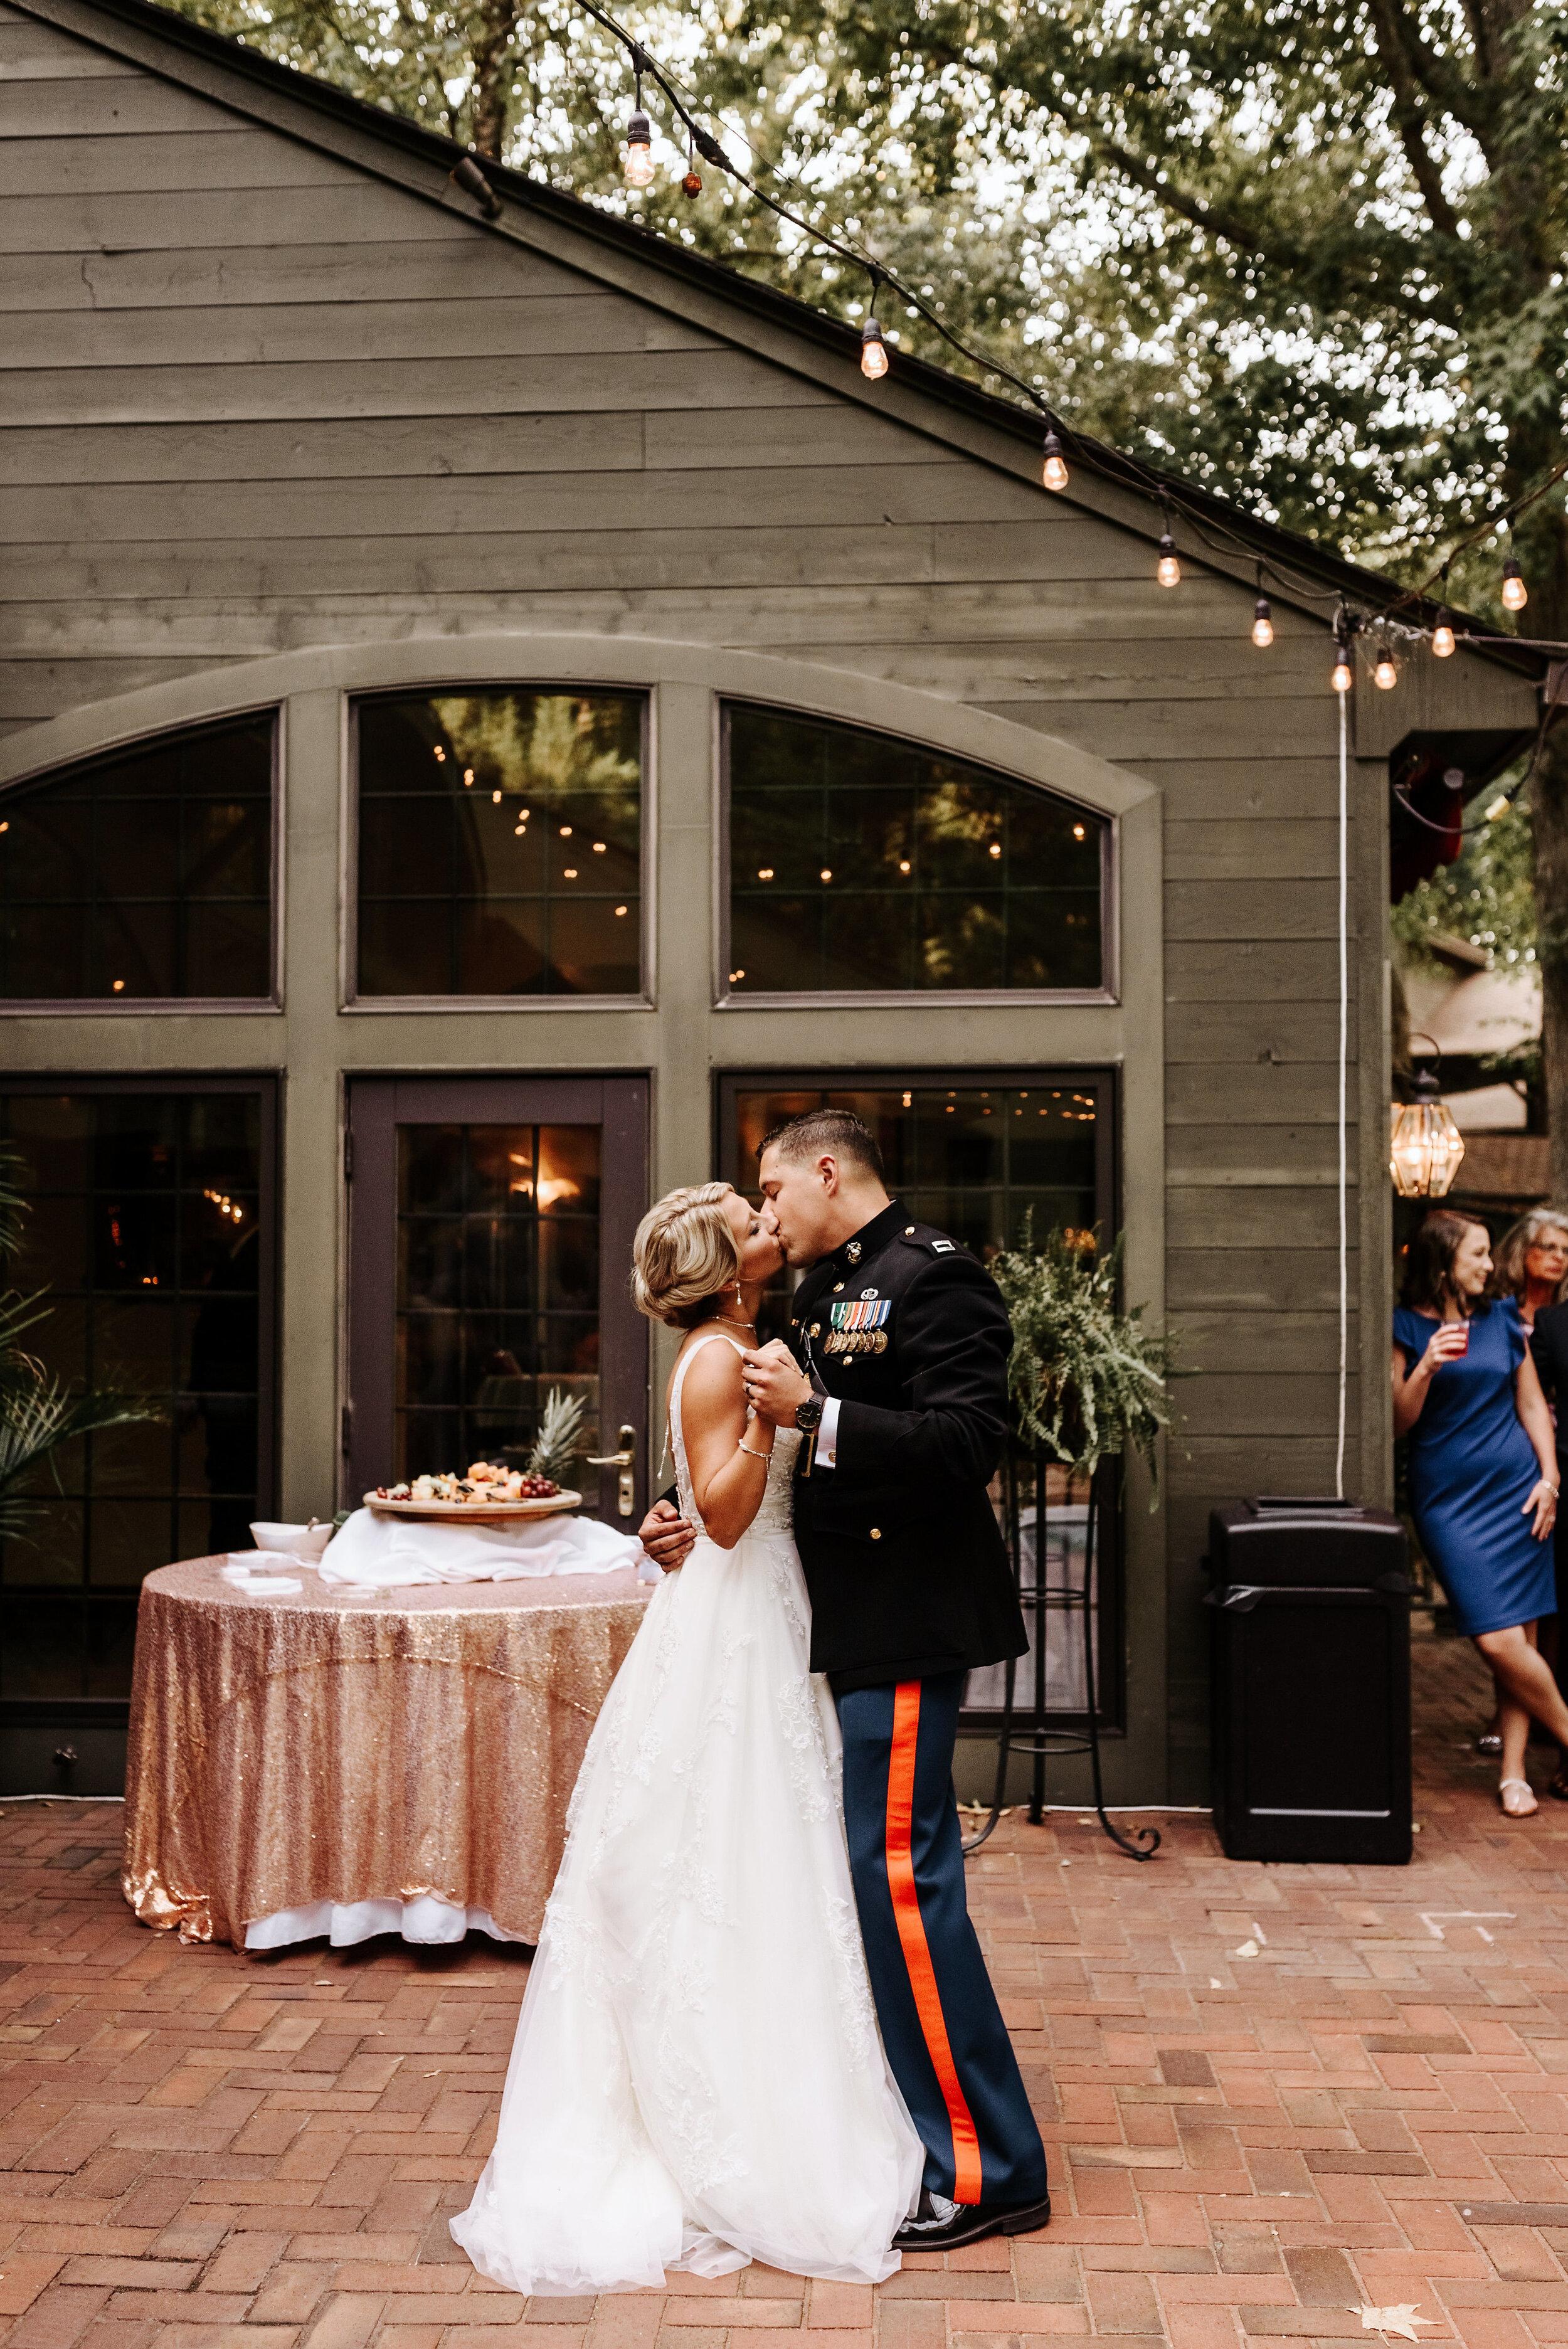 Emily_Mike_Wedding_Celebrations_at_the_Reservoir_Pool_Pavilion_Richmond_Virginia_Wedding_Photographer_Photography_by_V_73.jpg